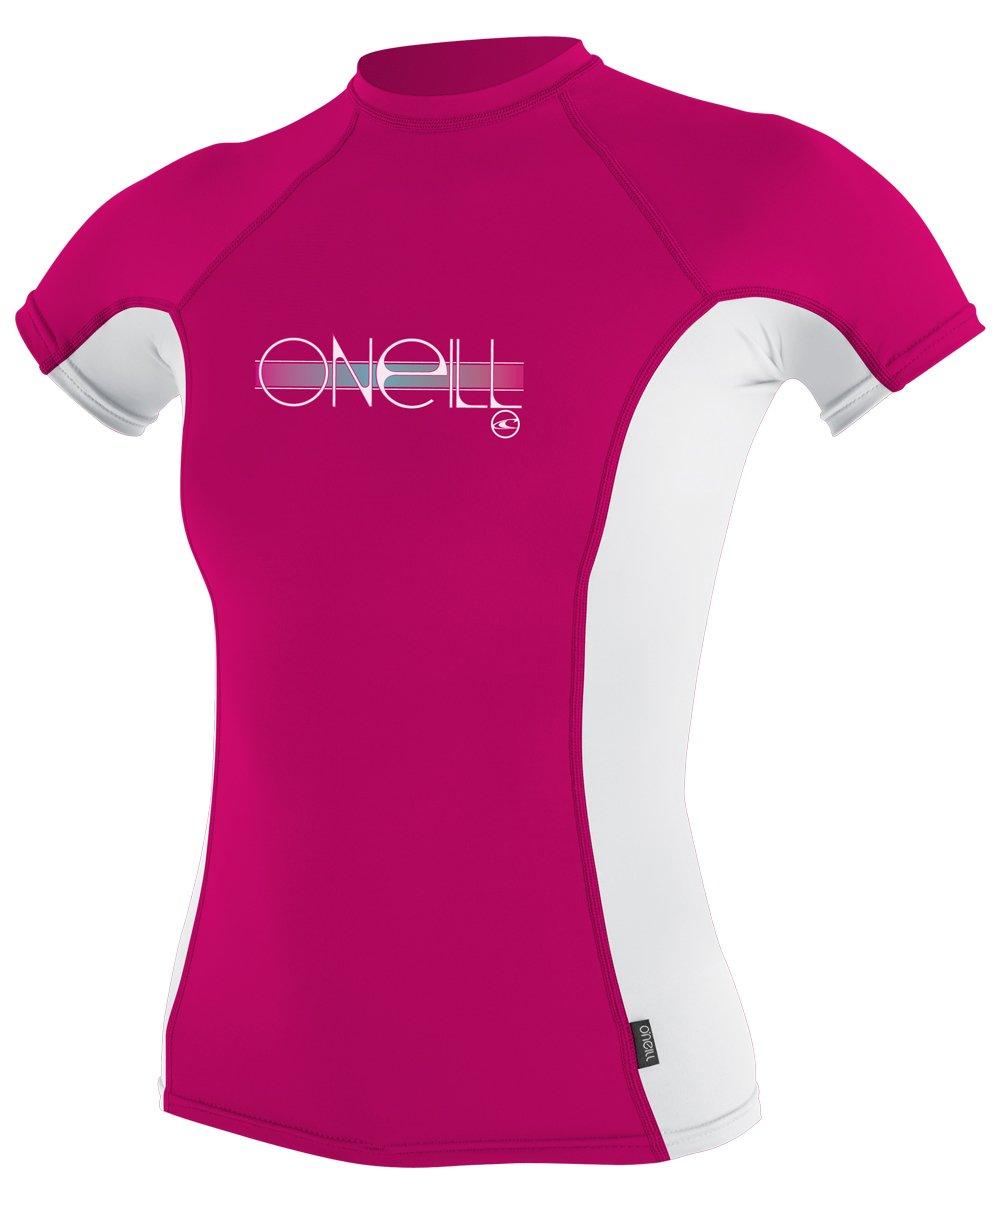 ONeill Wetsuits Girls UV Sun Protection Toddler Skins Short Sleeve Tee Rashguard